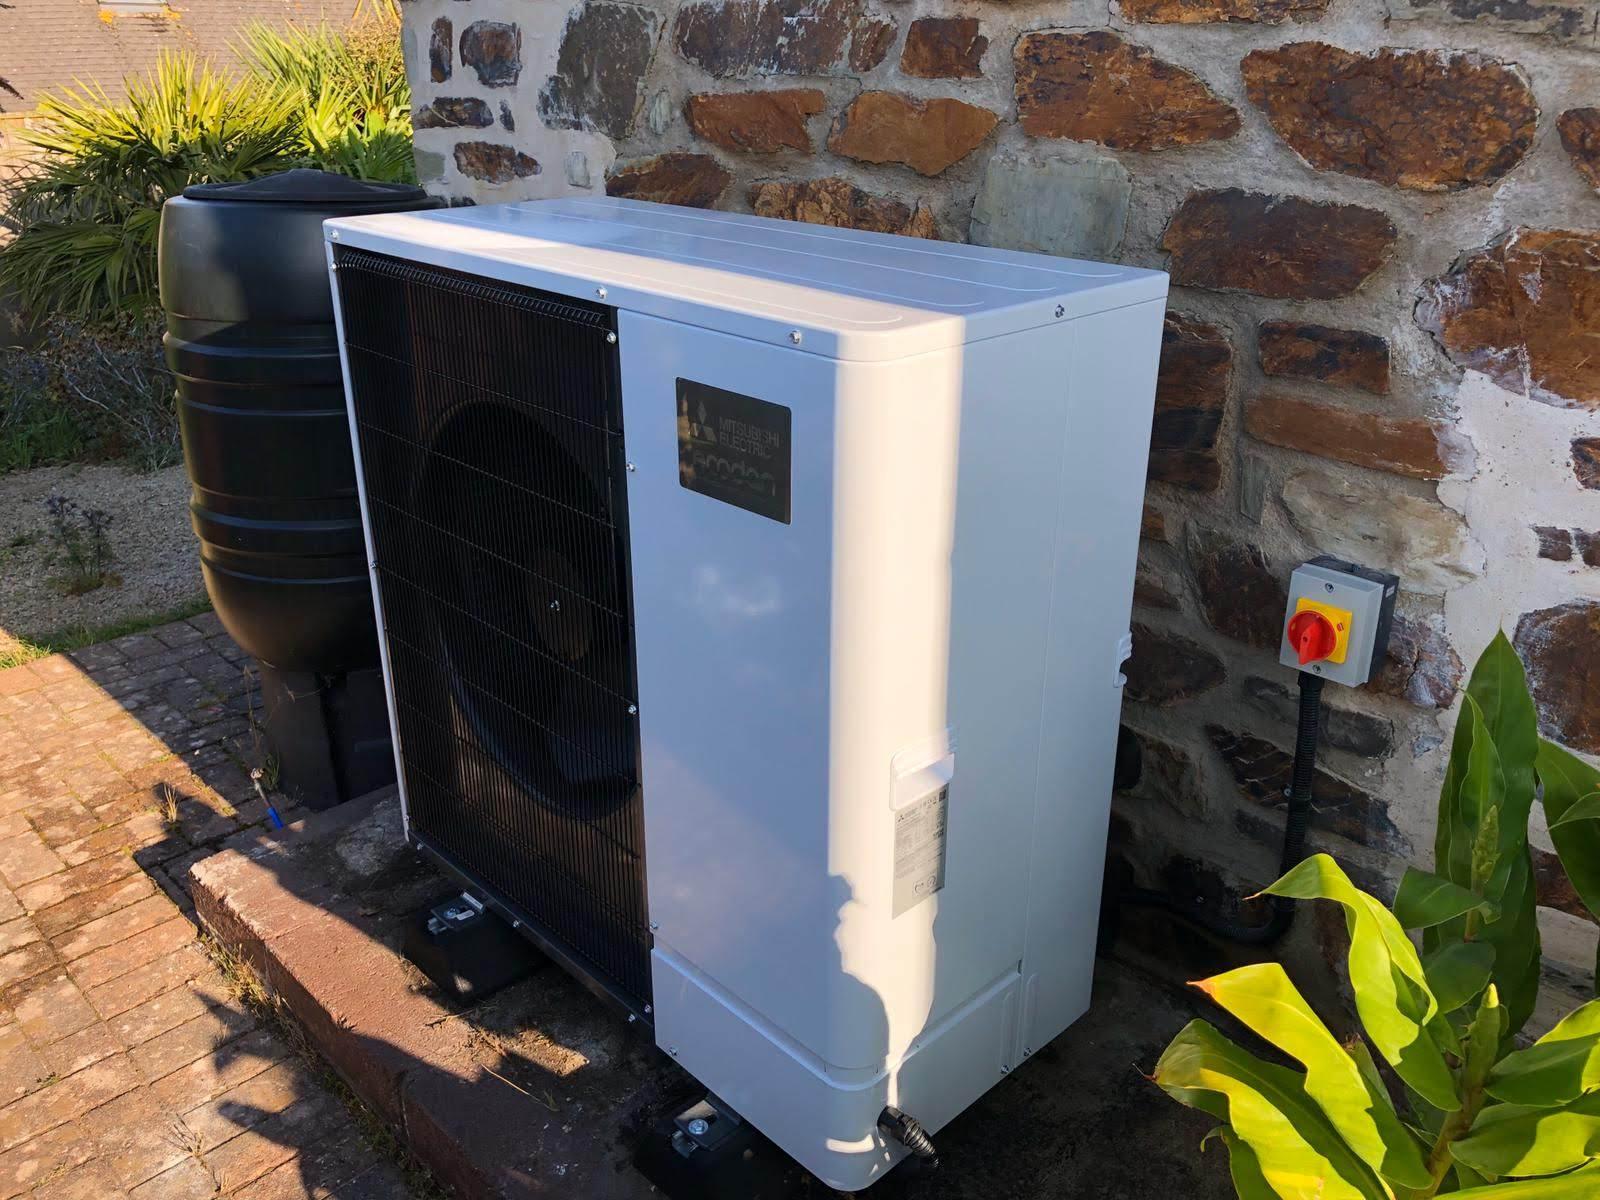 An Ultra Quiet Mitsubishi Ecdodan air source installation.